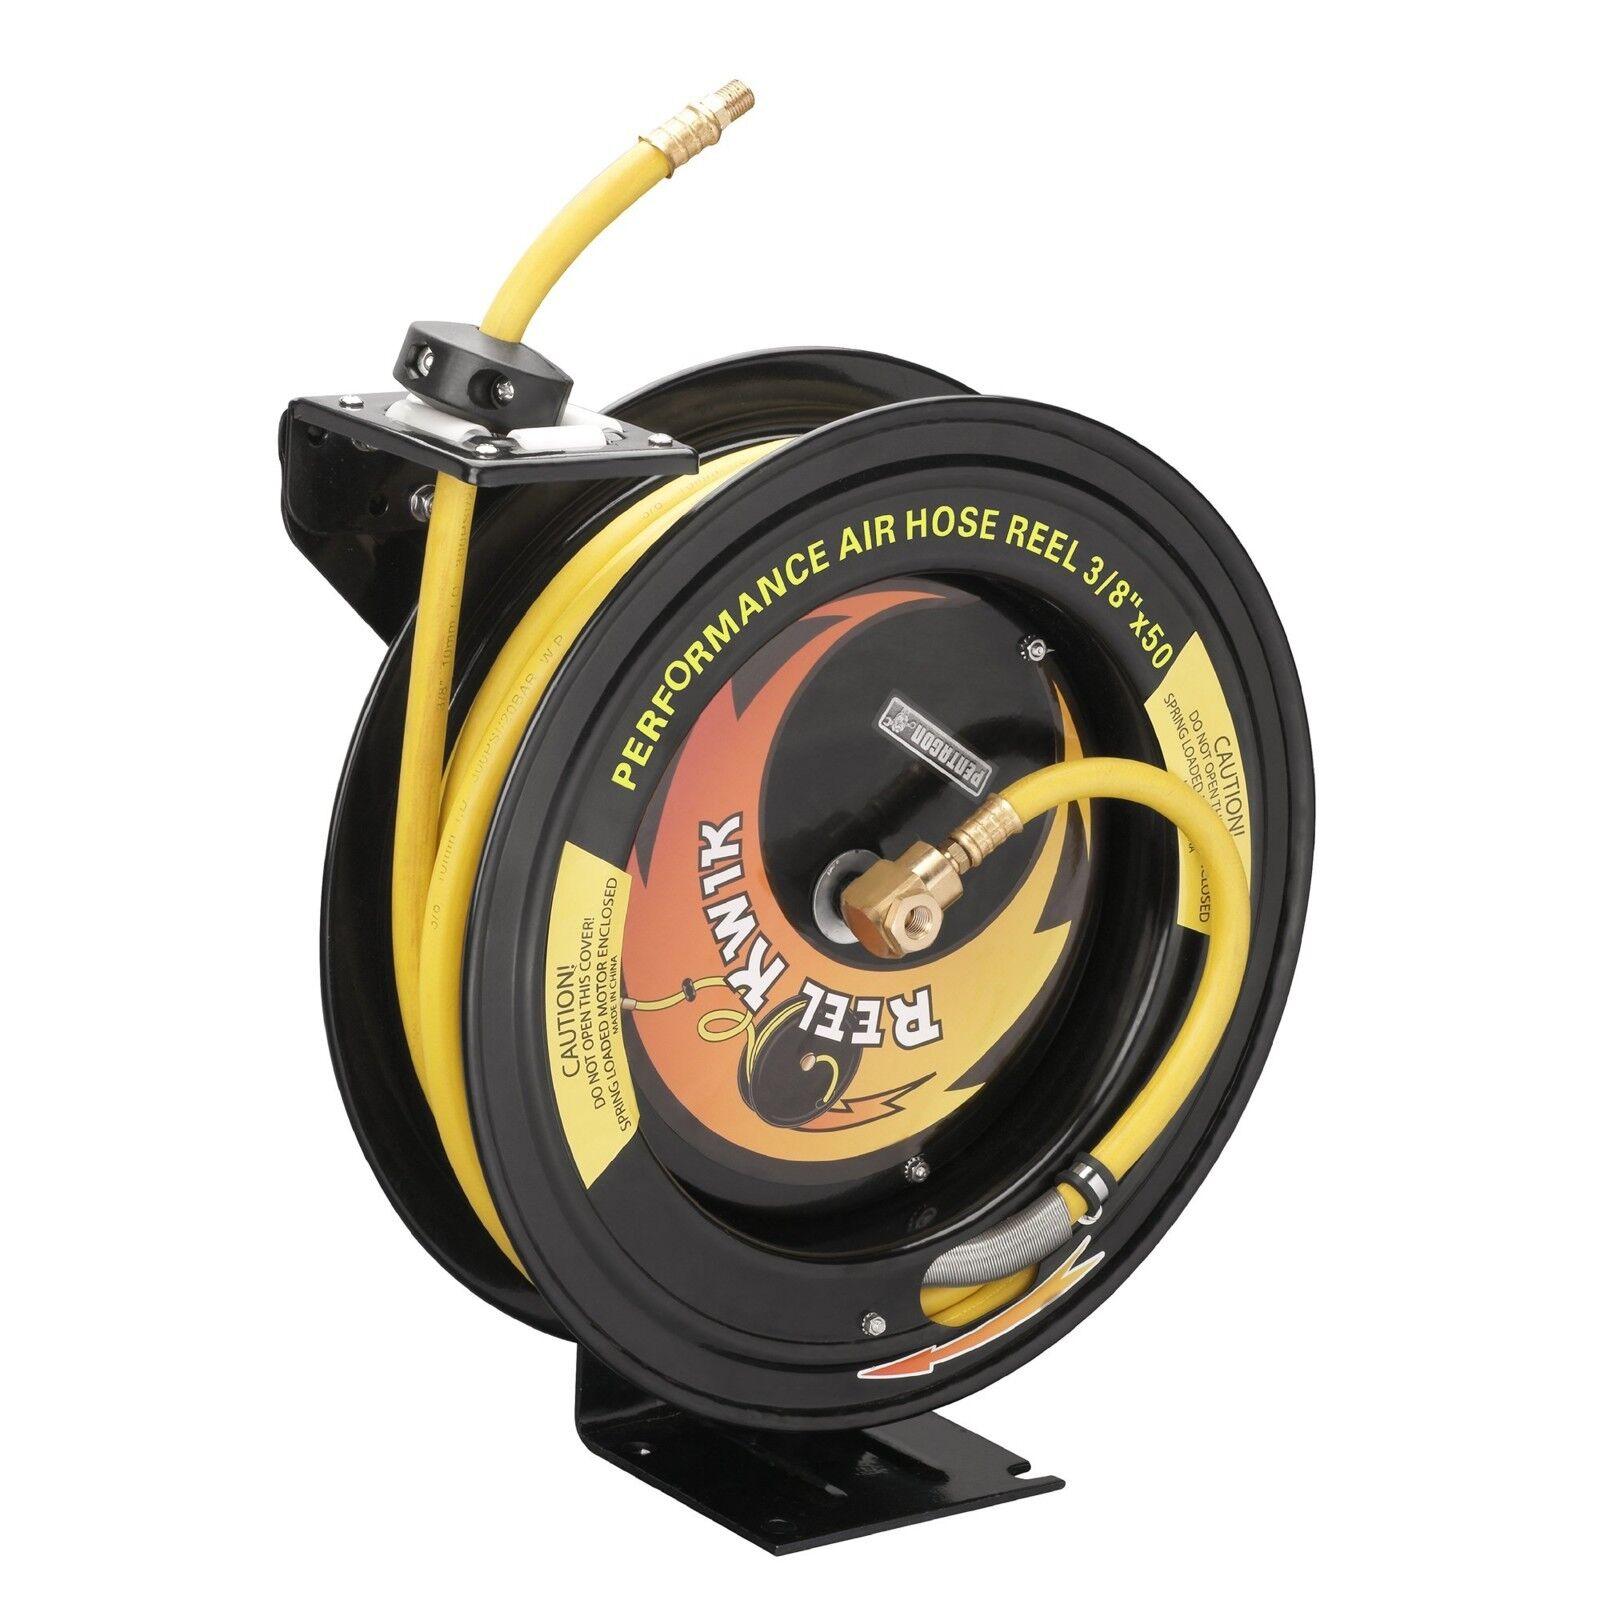 Compressed Air Hose Reel 50' 3 8 Retractable 300psi Auto Rewind Garage Shop Tool